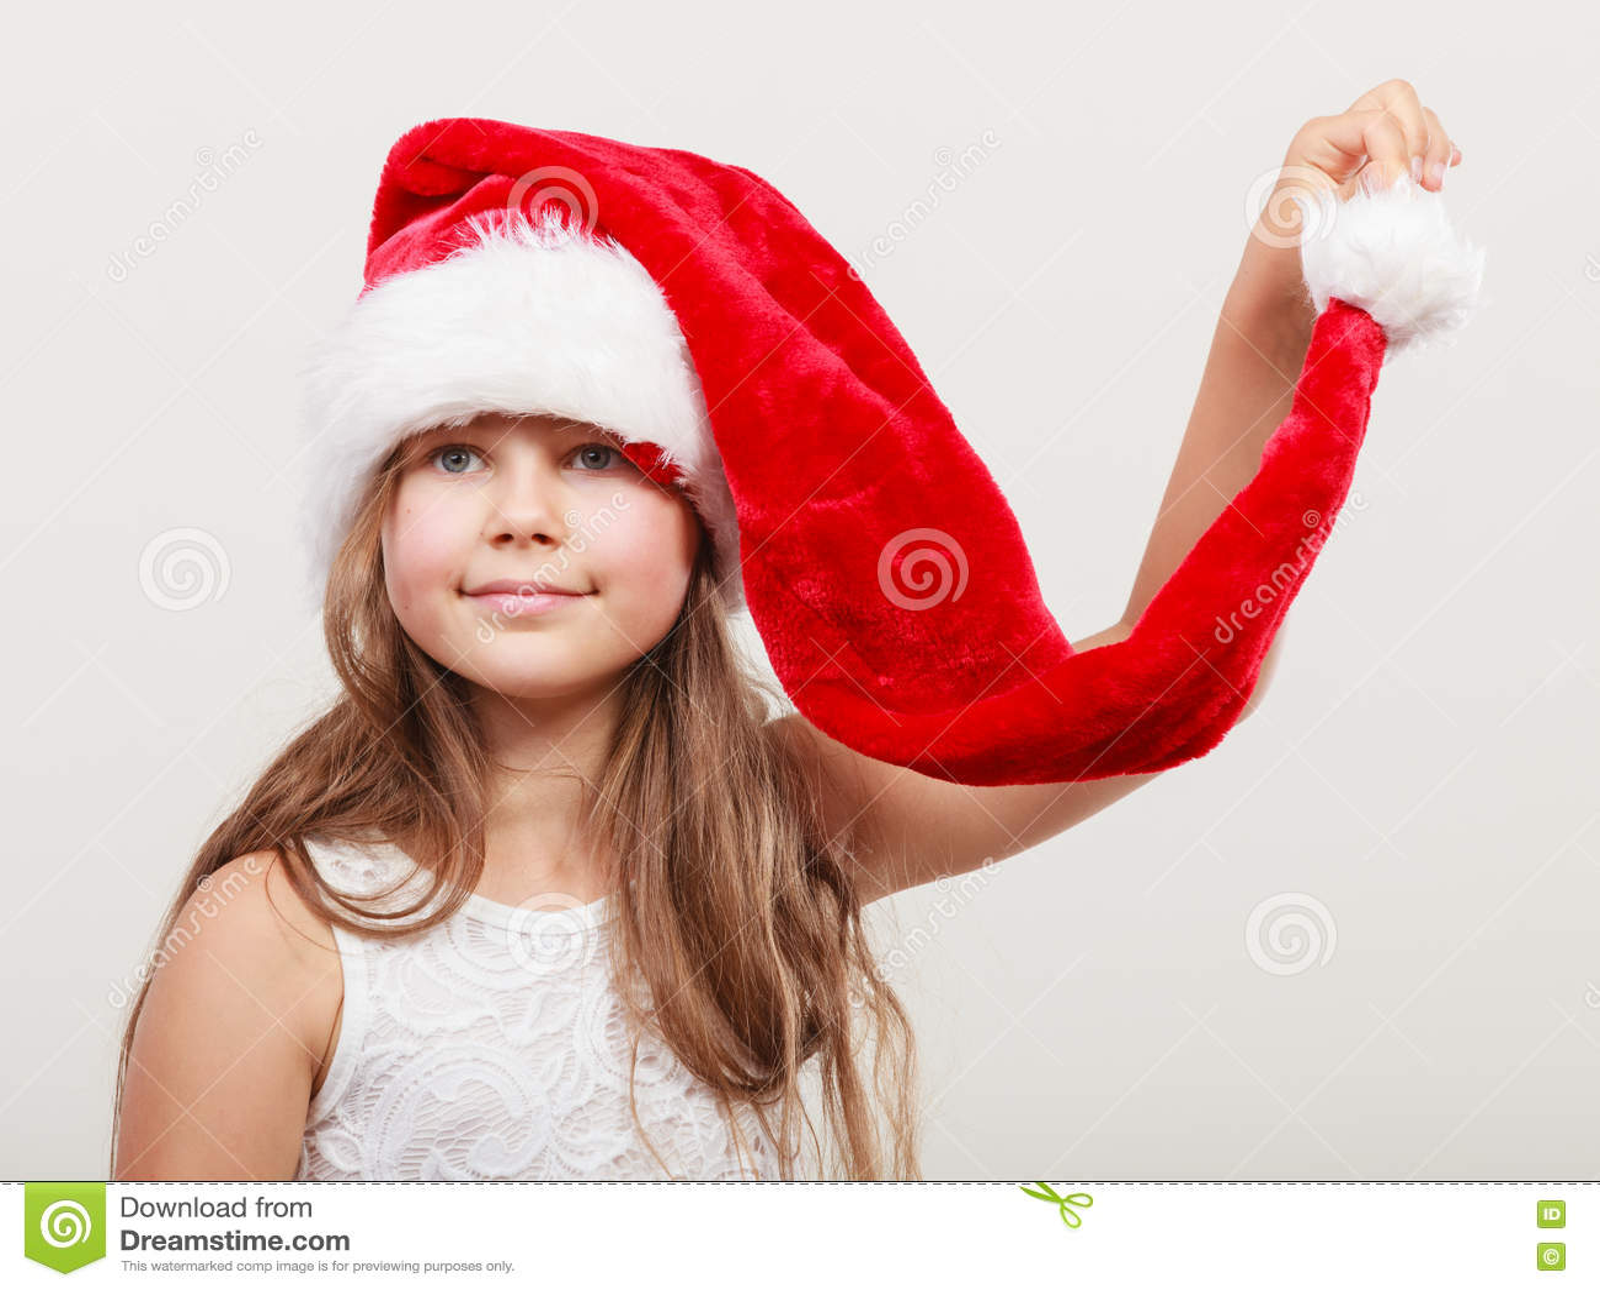 120996334b8e1 Little Girl Kid In Santa Claus Hat. Christmas. Stock Image - Image ...